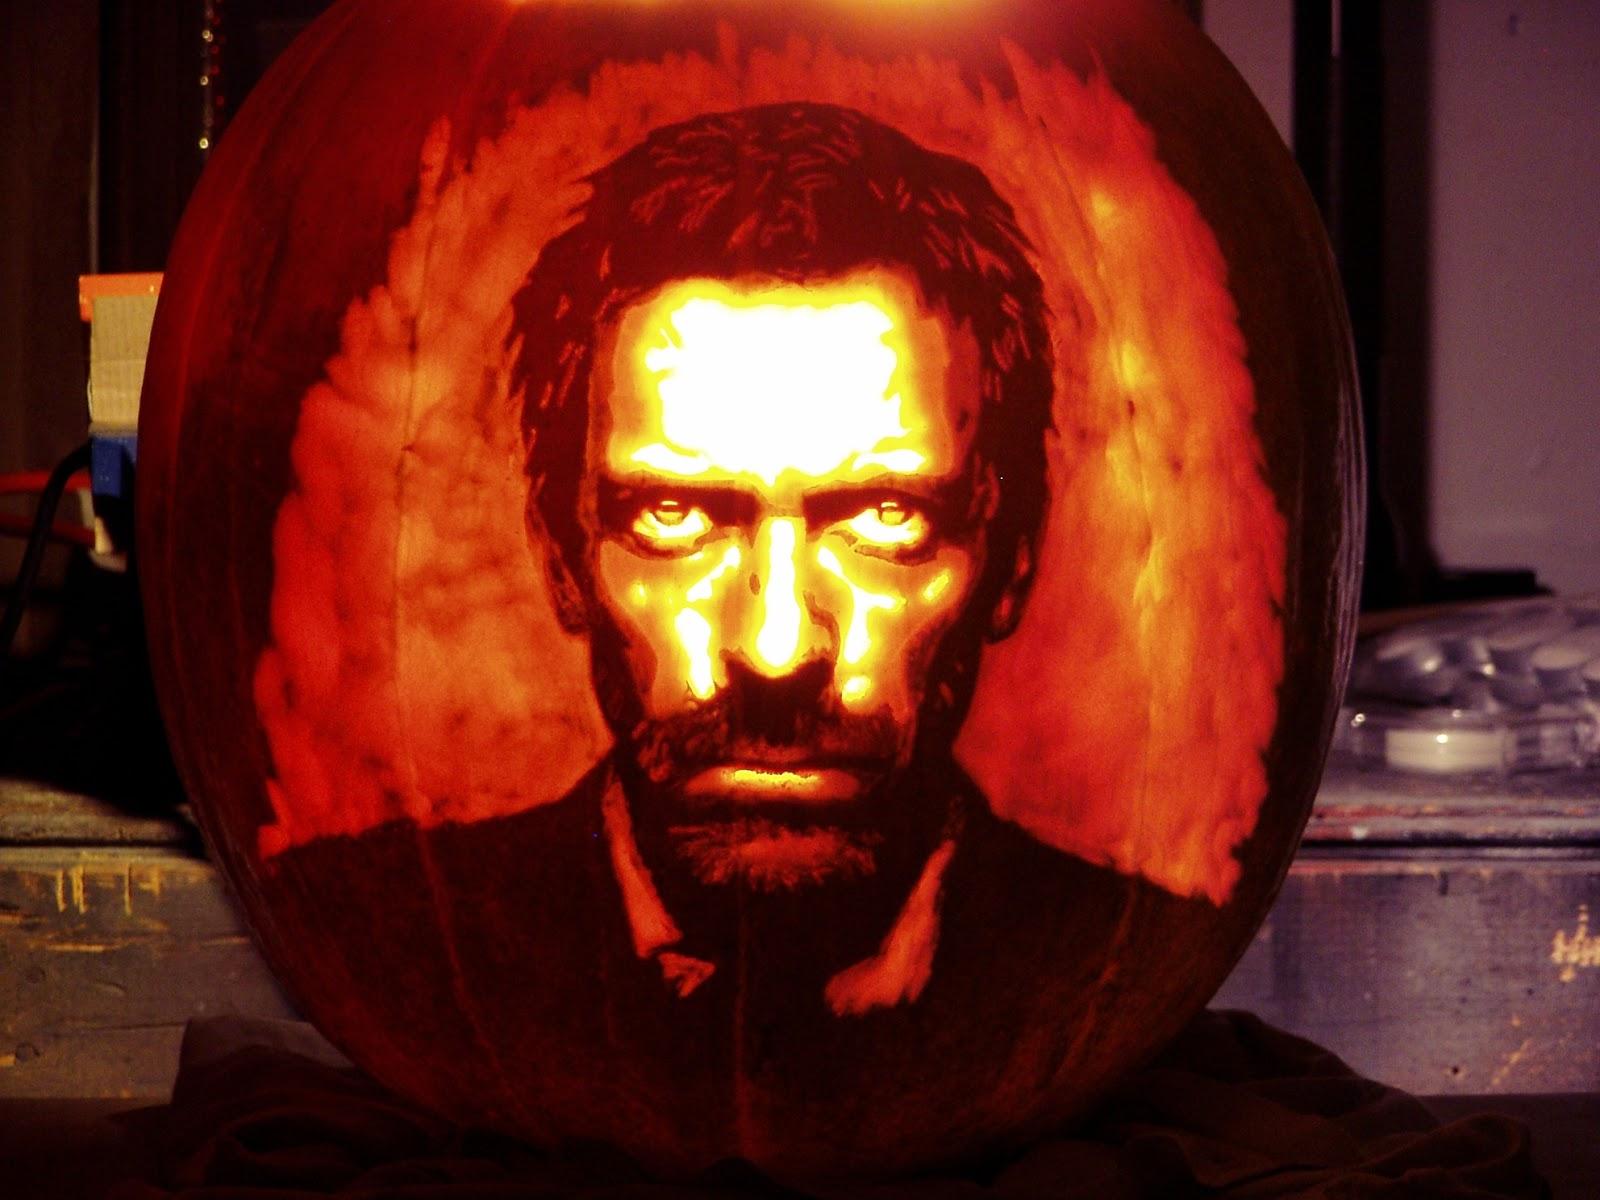 http://4.bp.blogspot.com/_w1jHA8uDX3c/TMdO6T9dOxI/AAAAAAAAA_g/K8i--Ecum2I/s1600/House-pumpkin-house-md-16490908-1984-1488.jpg